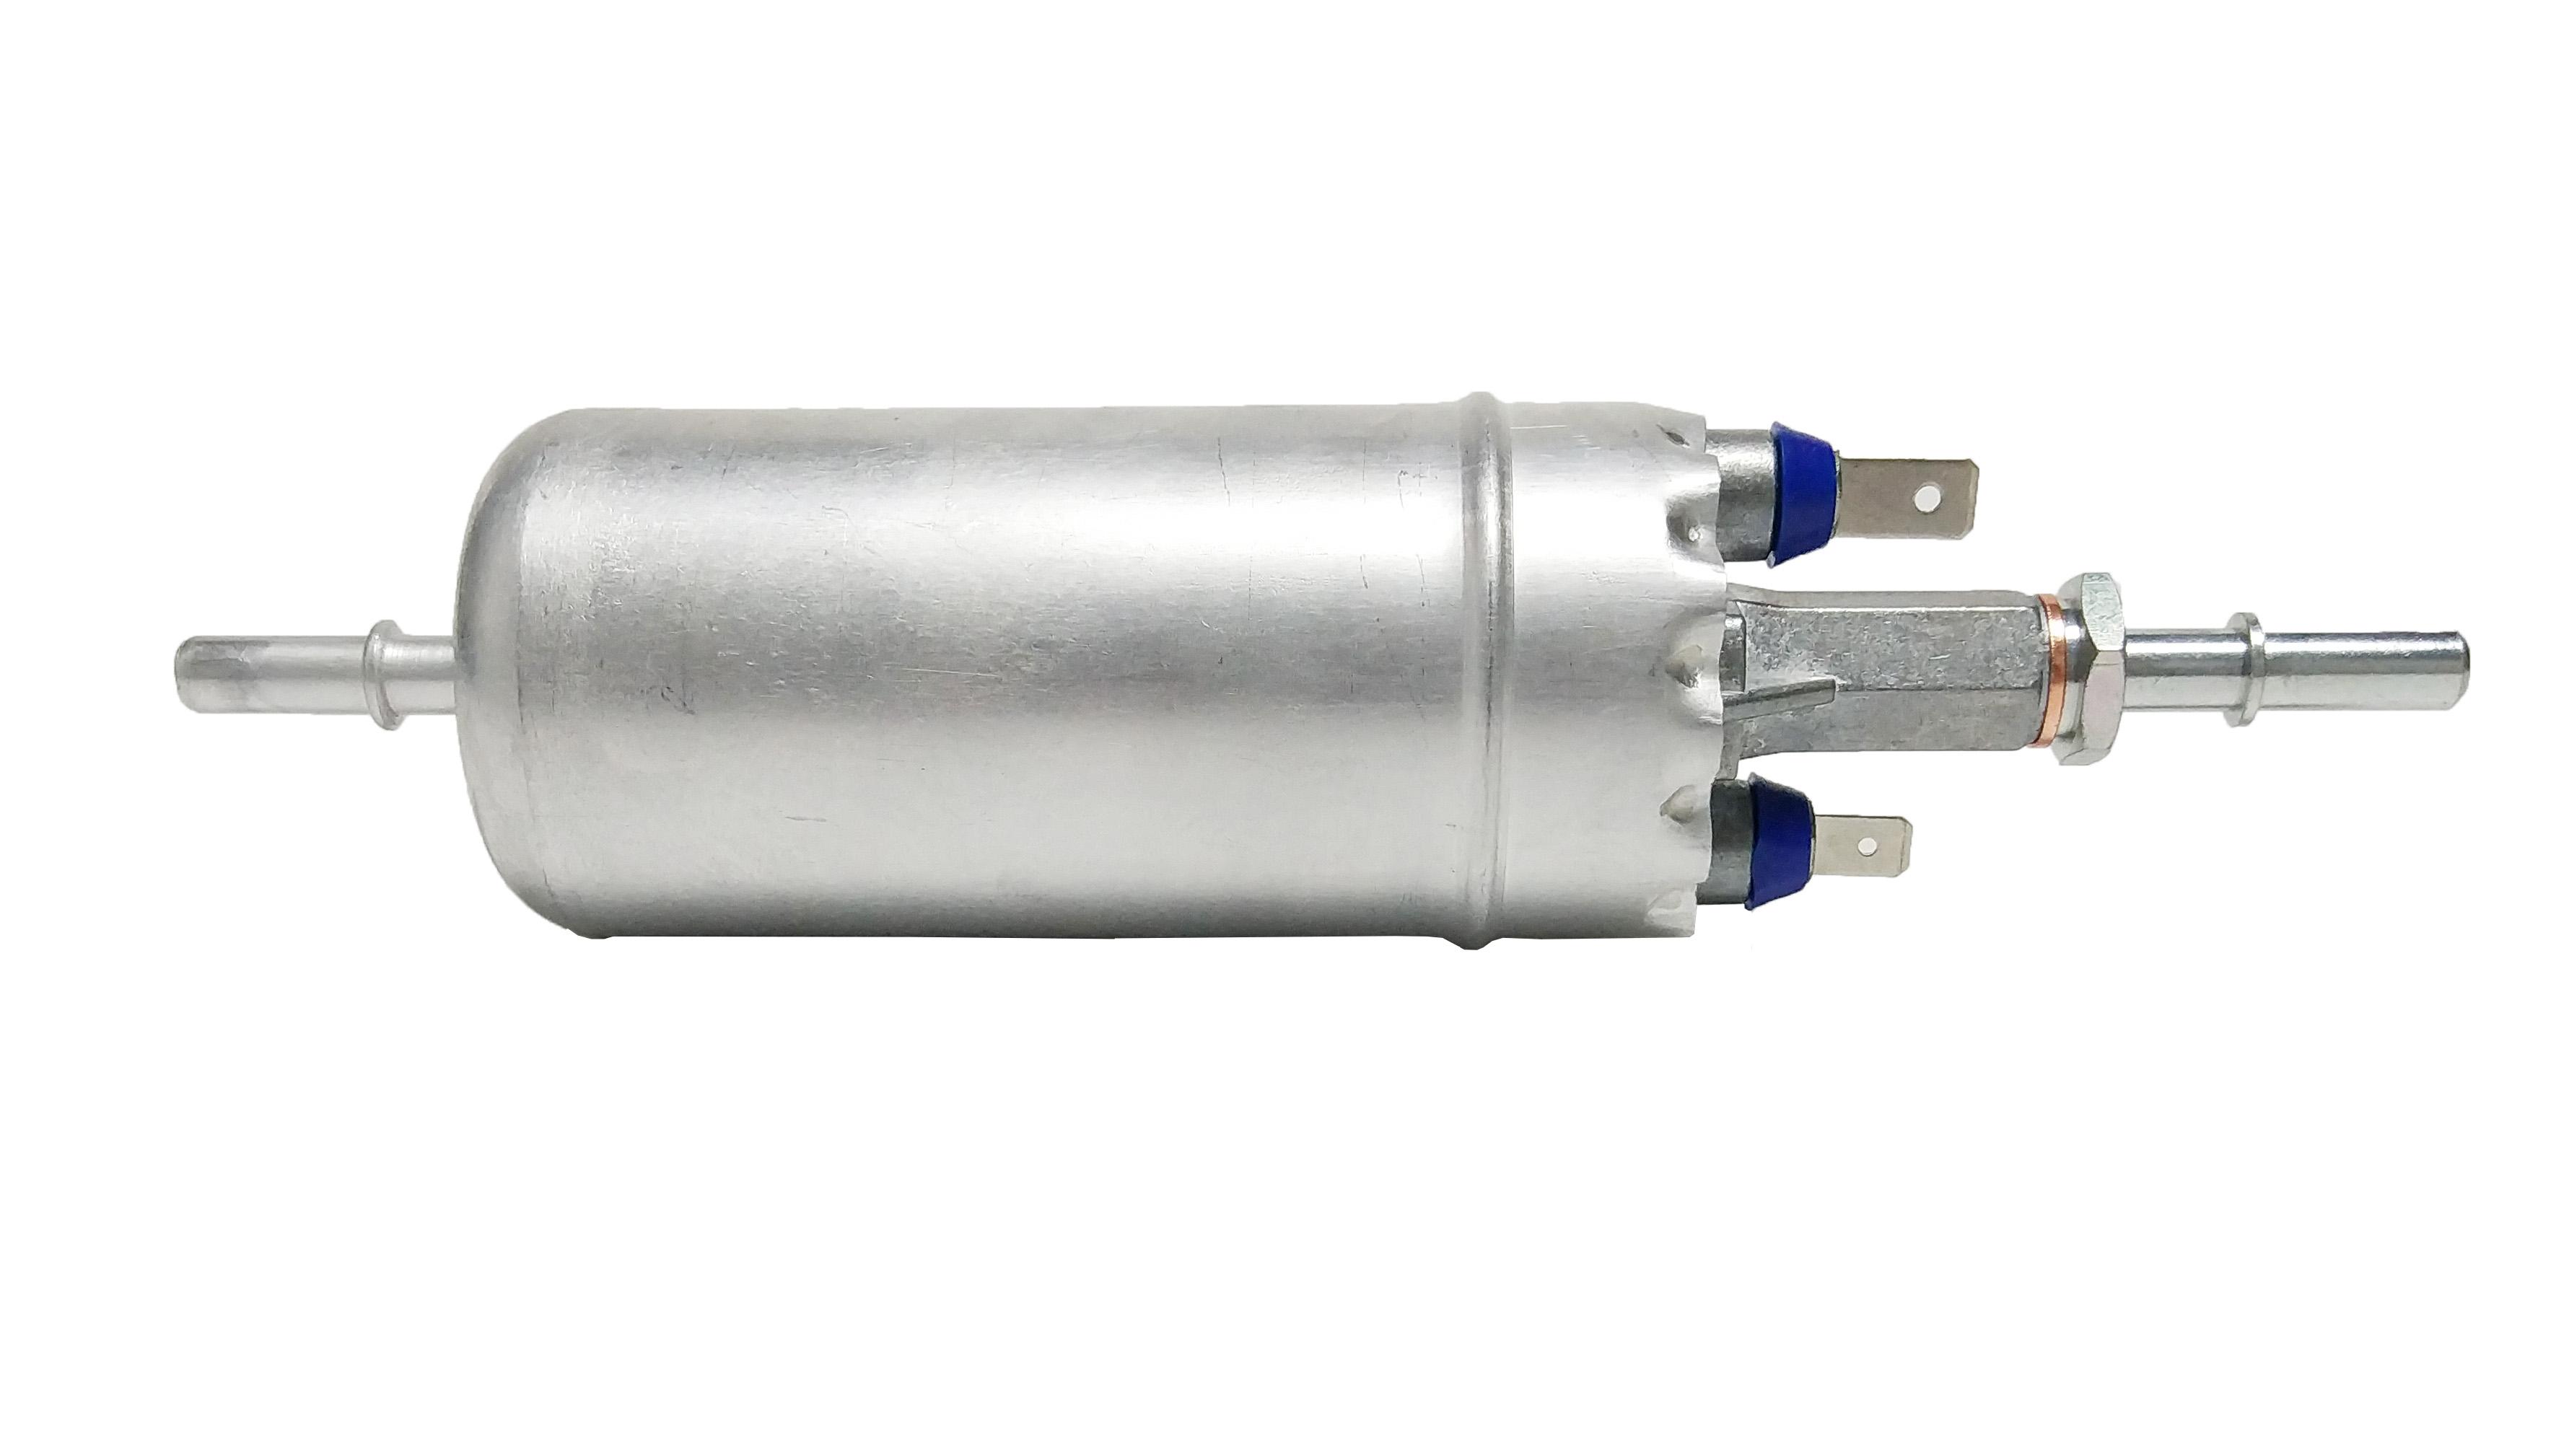 Ford 73l Powerstroke Diesel Fuel Pump F250 F350 98 03 Replaces 7 3 Quality Warranty